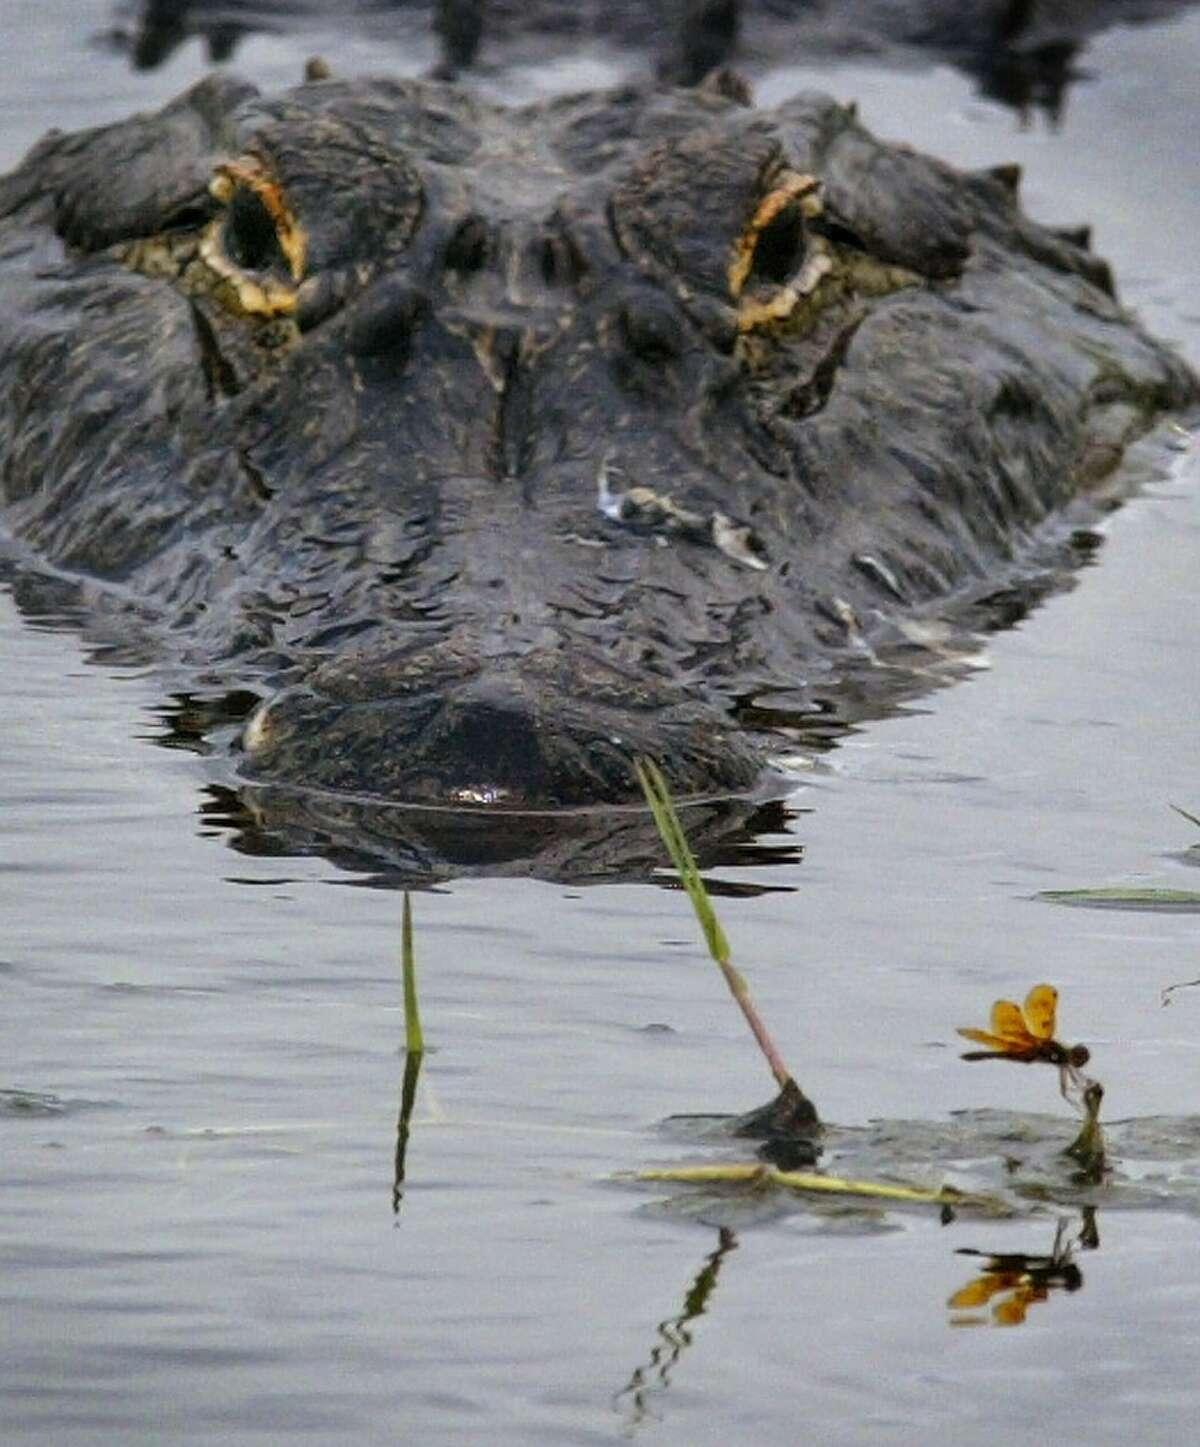 Alligator General Season: Core Counties: Sep. 10-30 Non-core Counties: Apr. 1- June 30